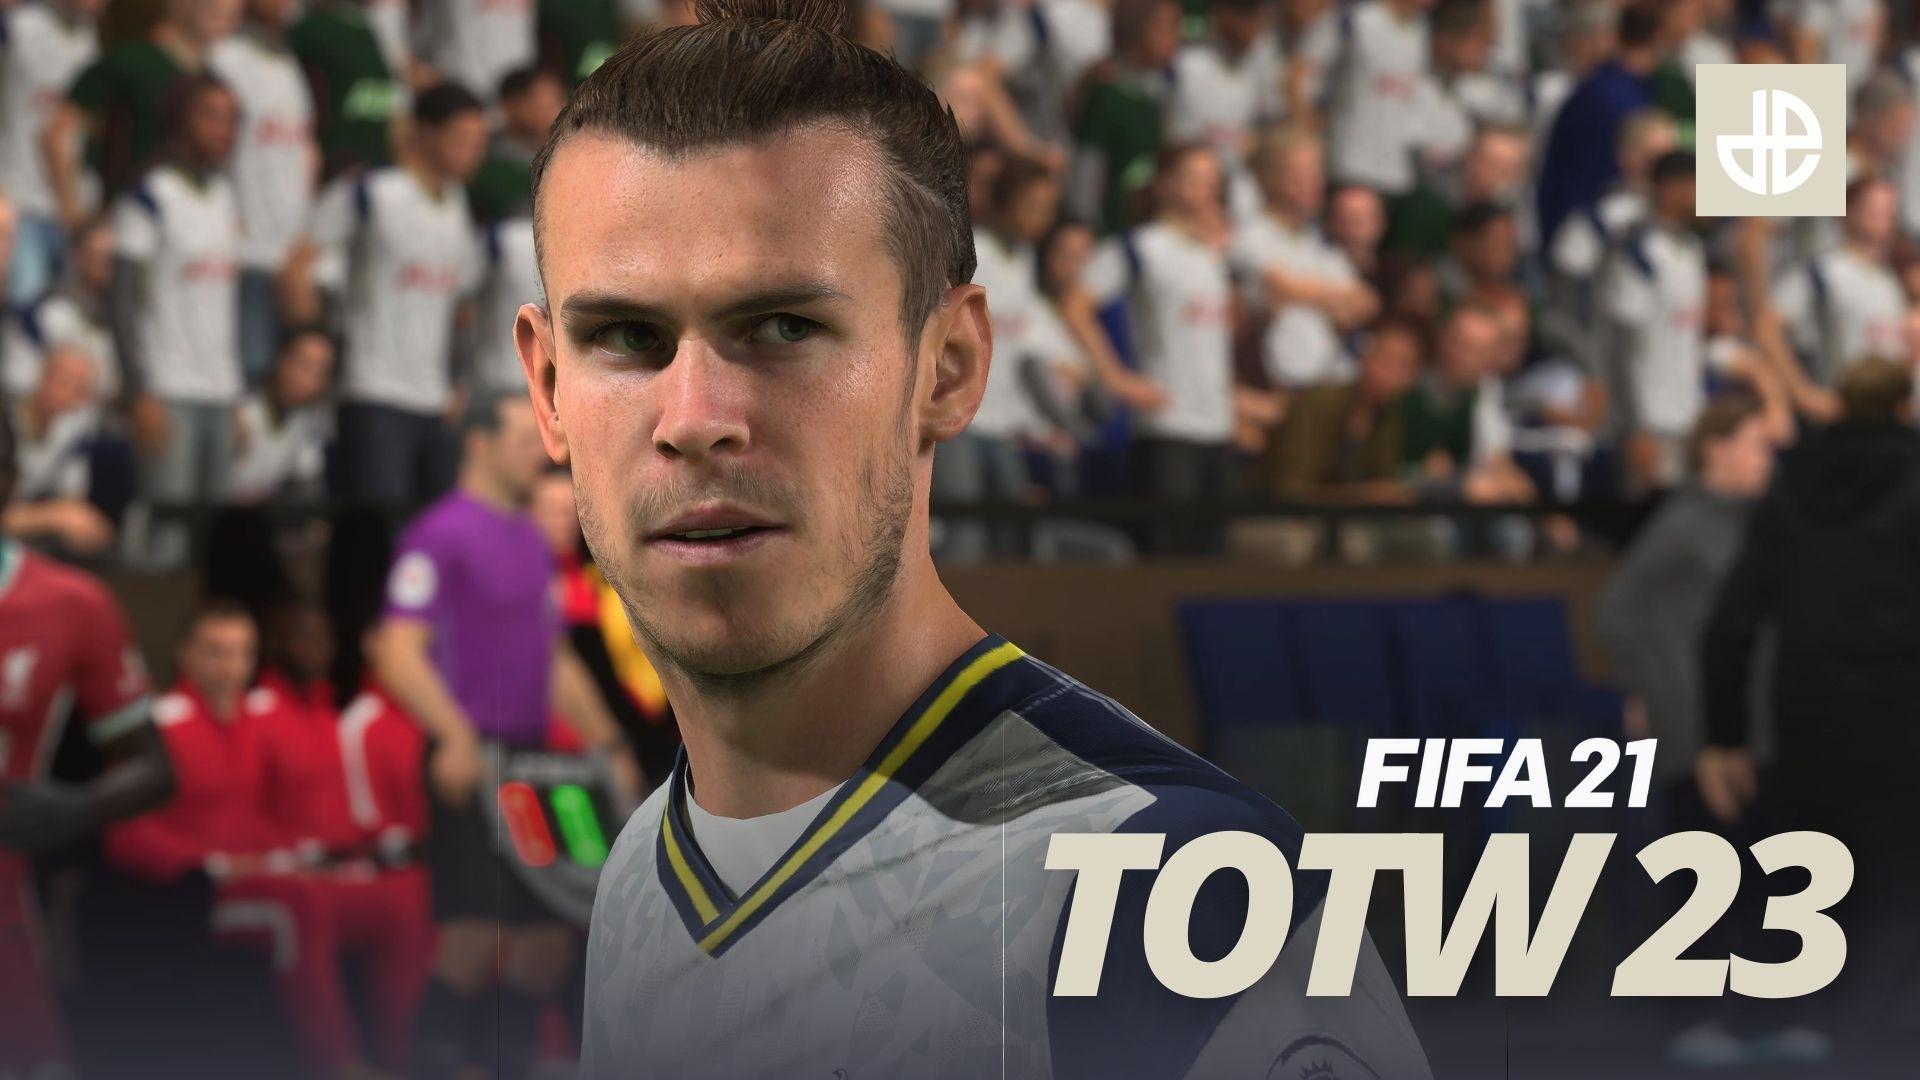 Gareth Bale Tottenham stands over FIFA 21 TOTW 23 Team of the Week.